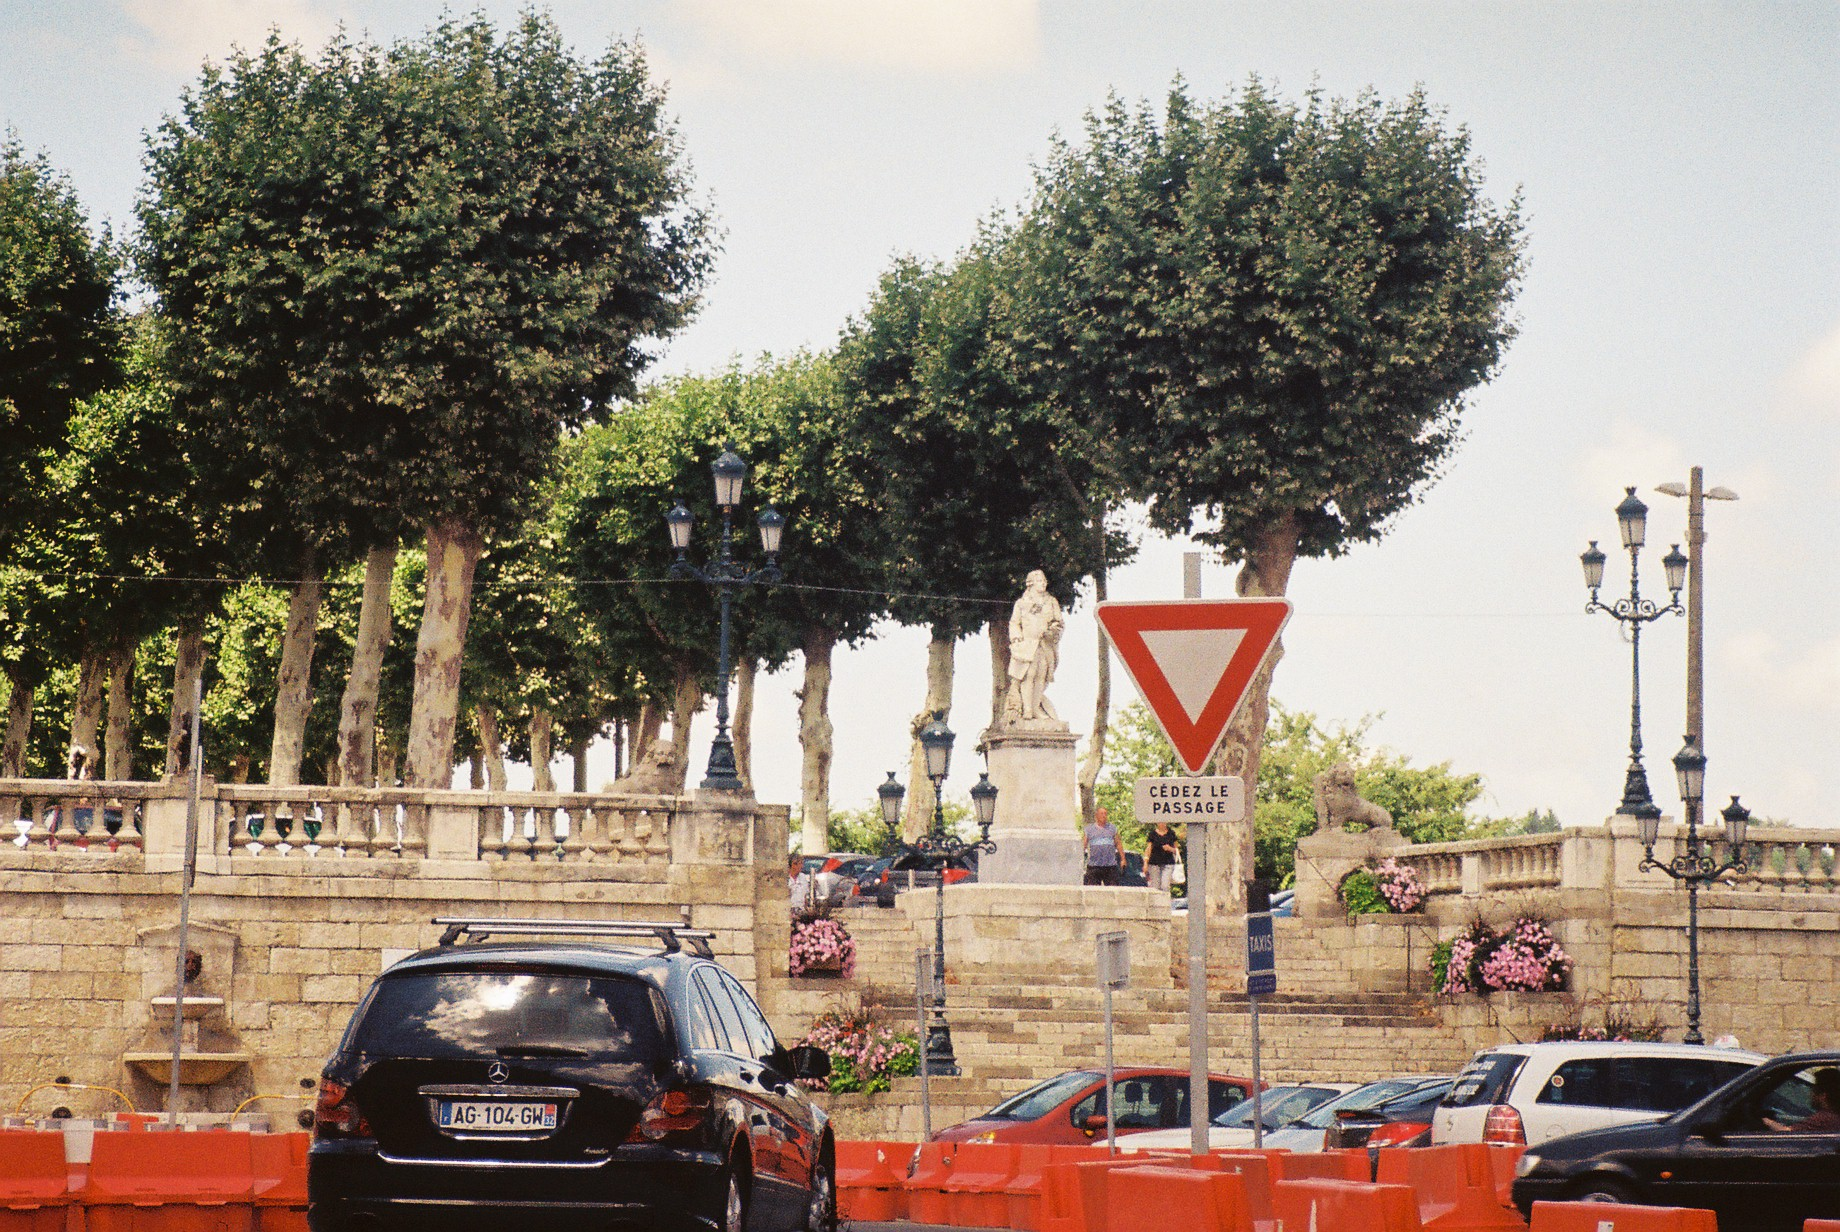 Auch pl de la liberation to promenade prefecture de Gers jul10